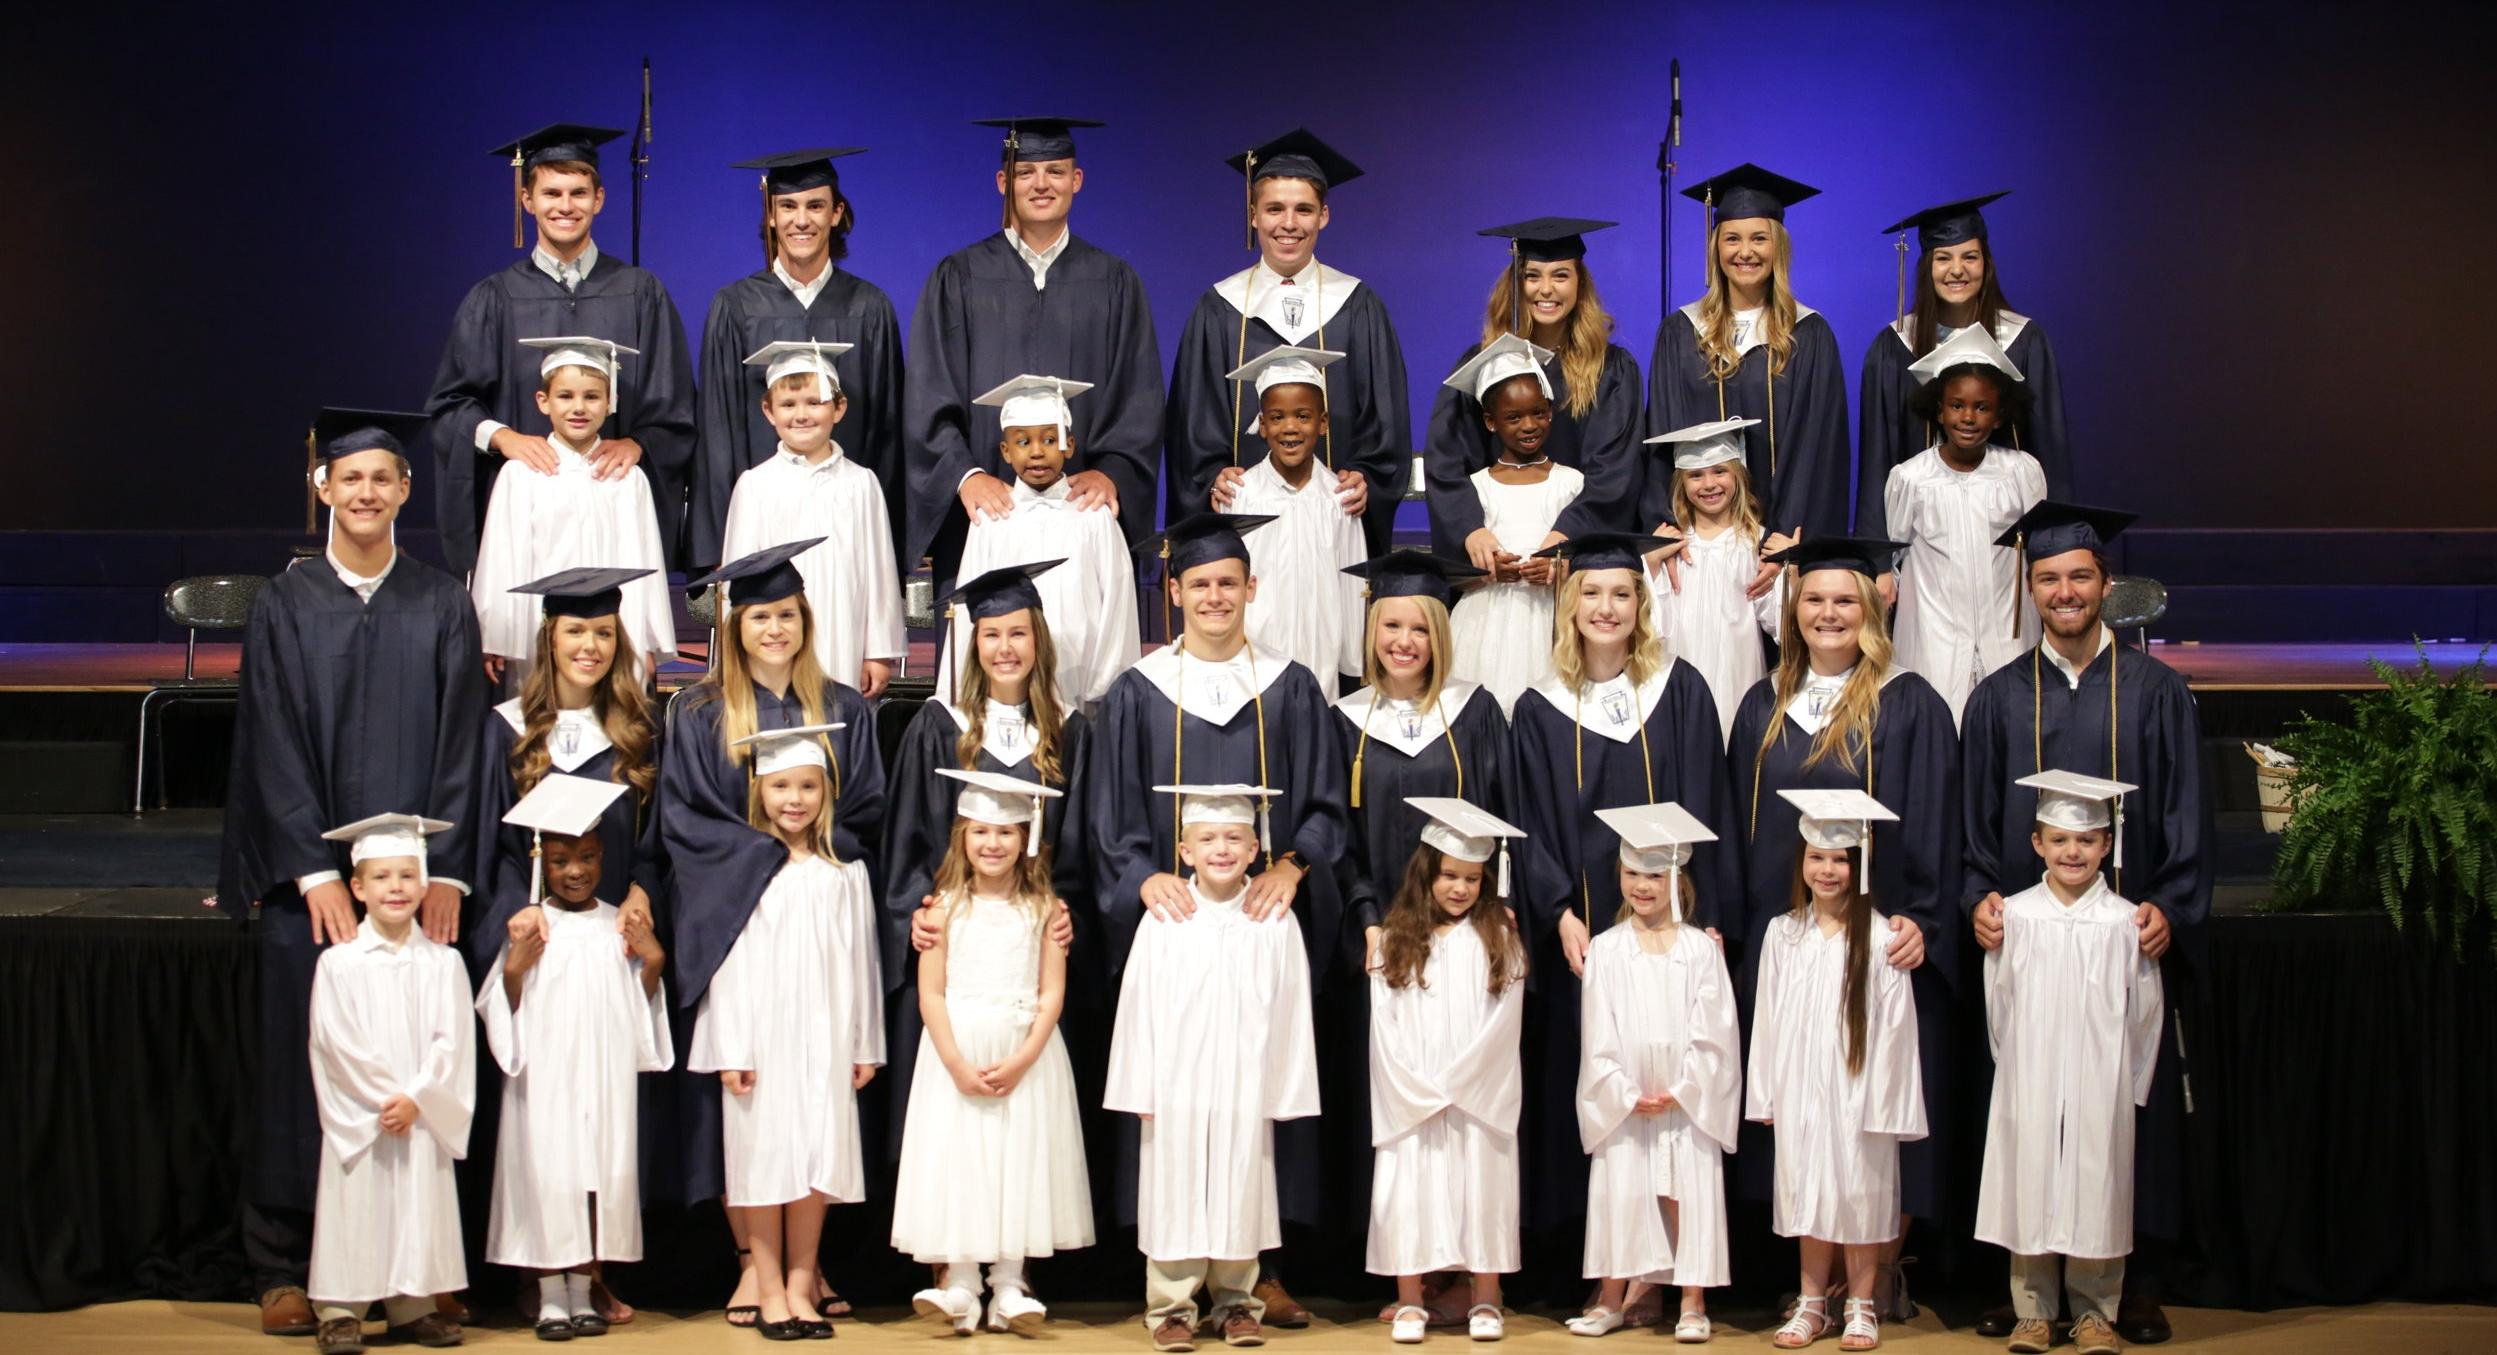 Class of 2017 and Kindergarten Grad-to-Grad Students